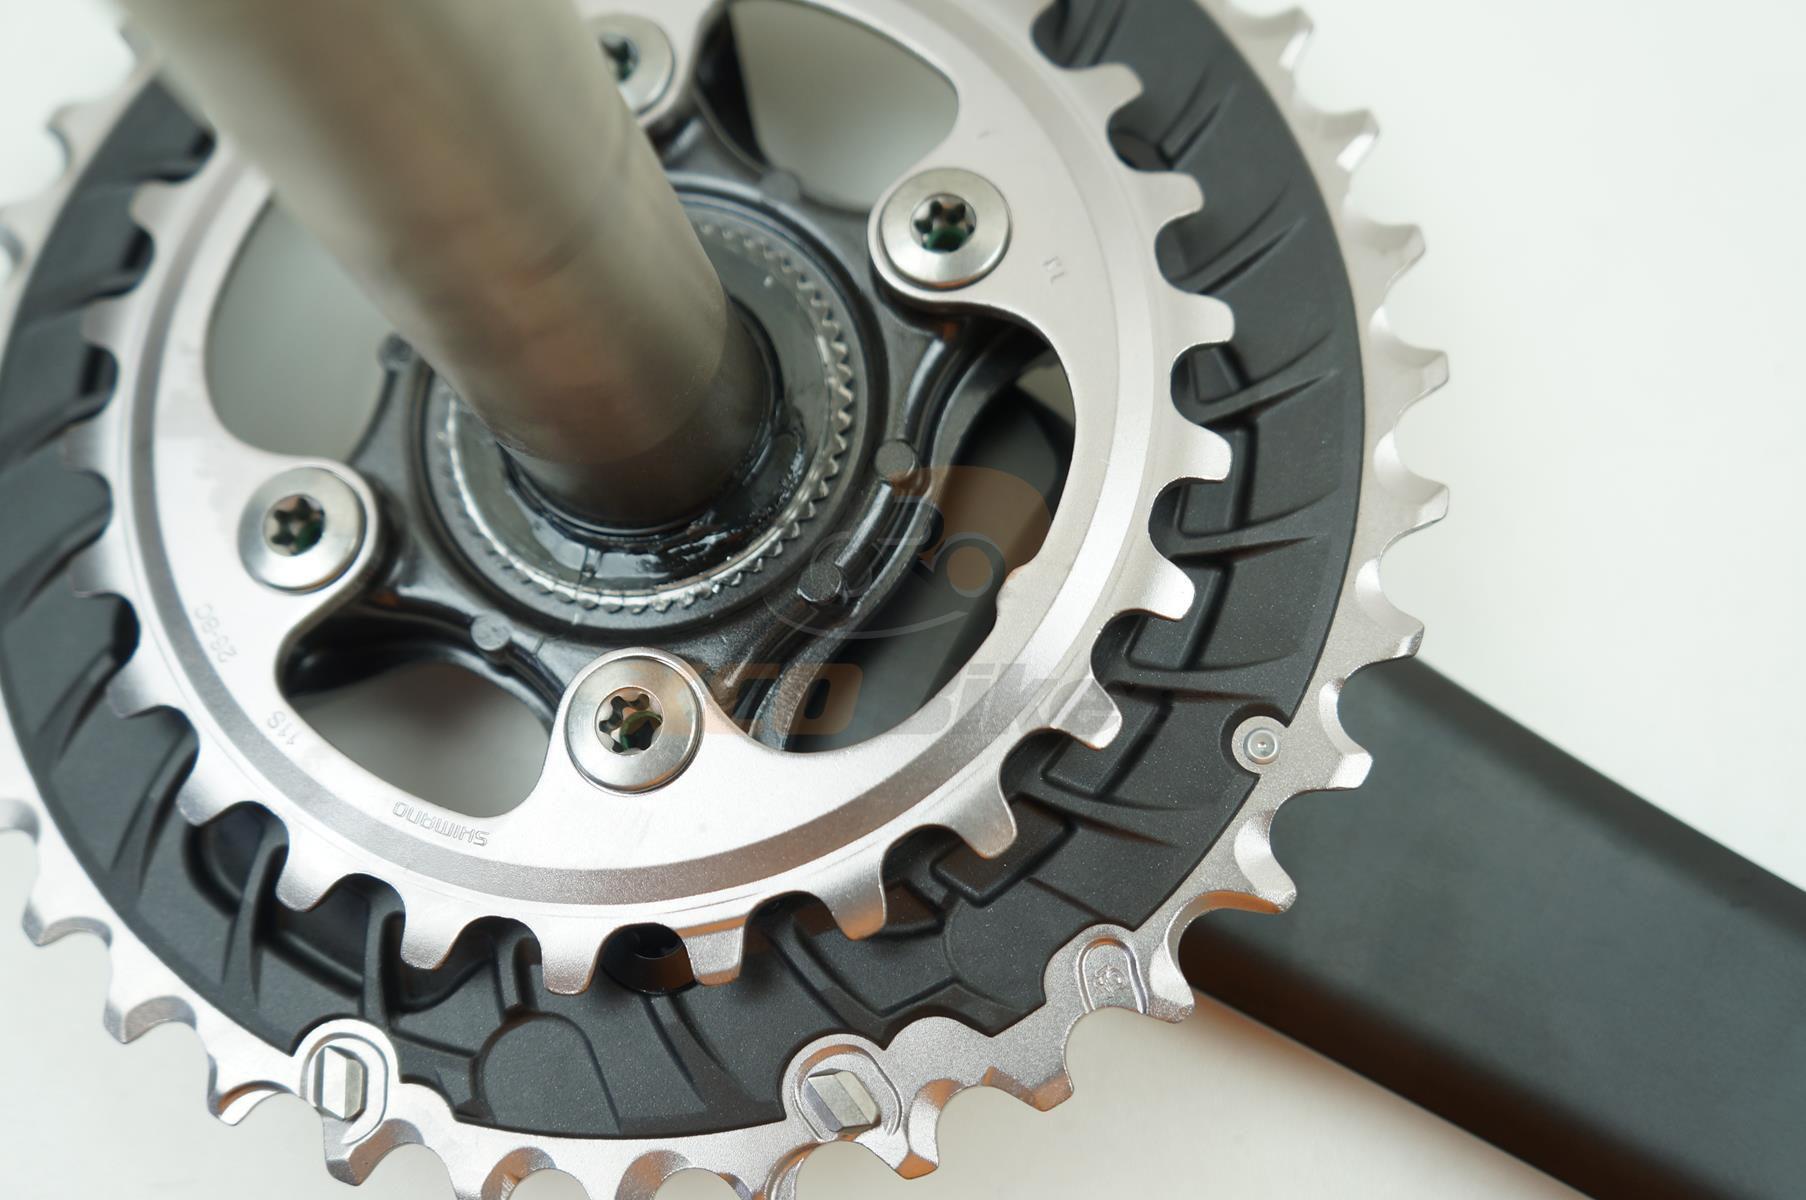 Pedivela Bicicleta Shimano Deore XT M8000 36-26 175mm 2x11 velocidades